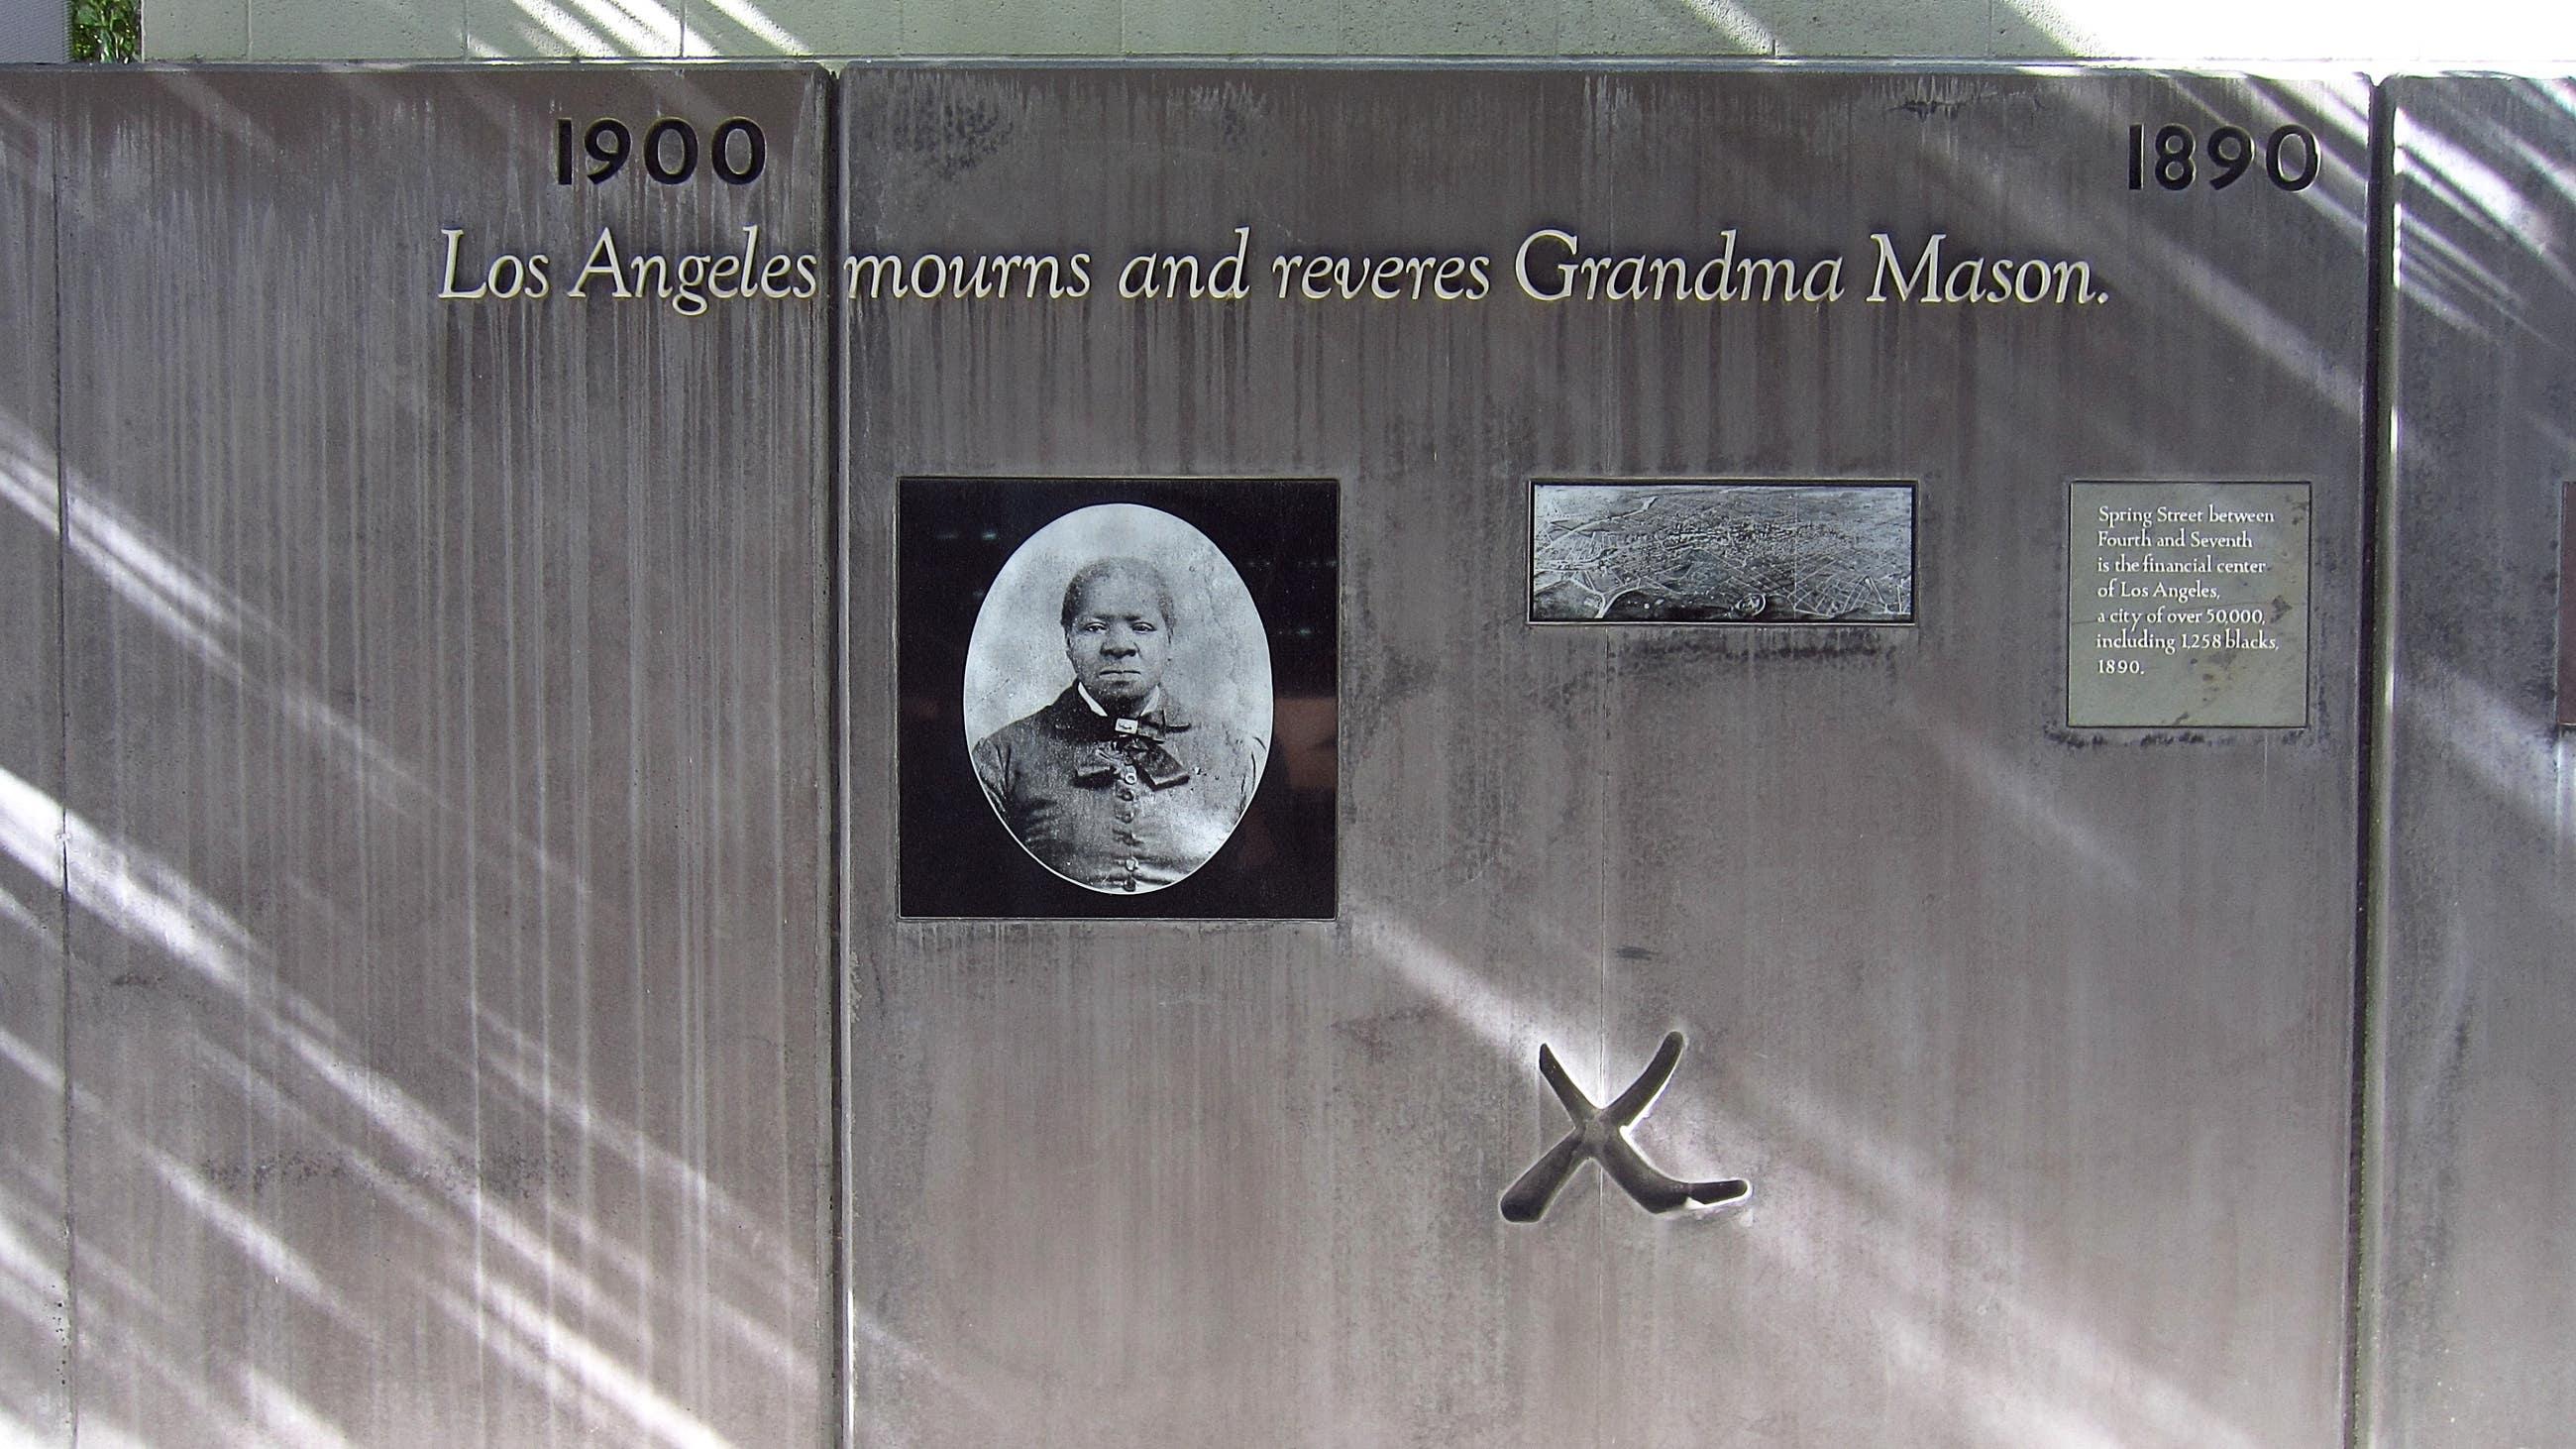 Timeline at Biddy Mason Memorial Park in Downtown LA